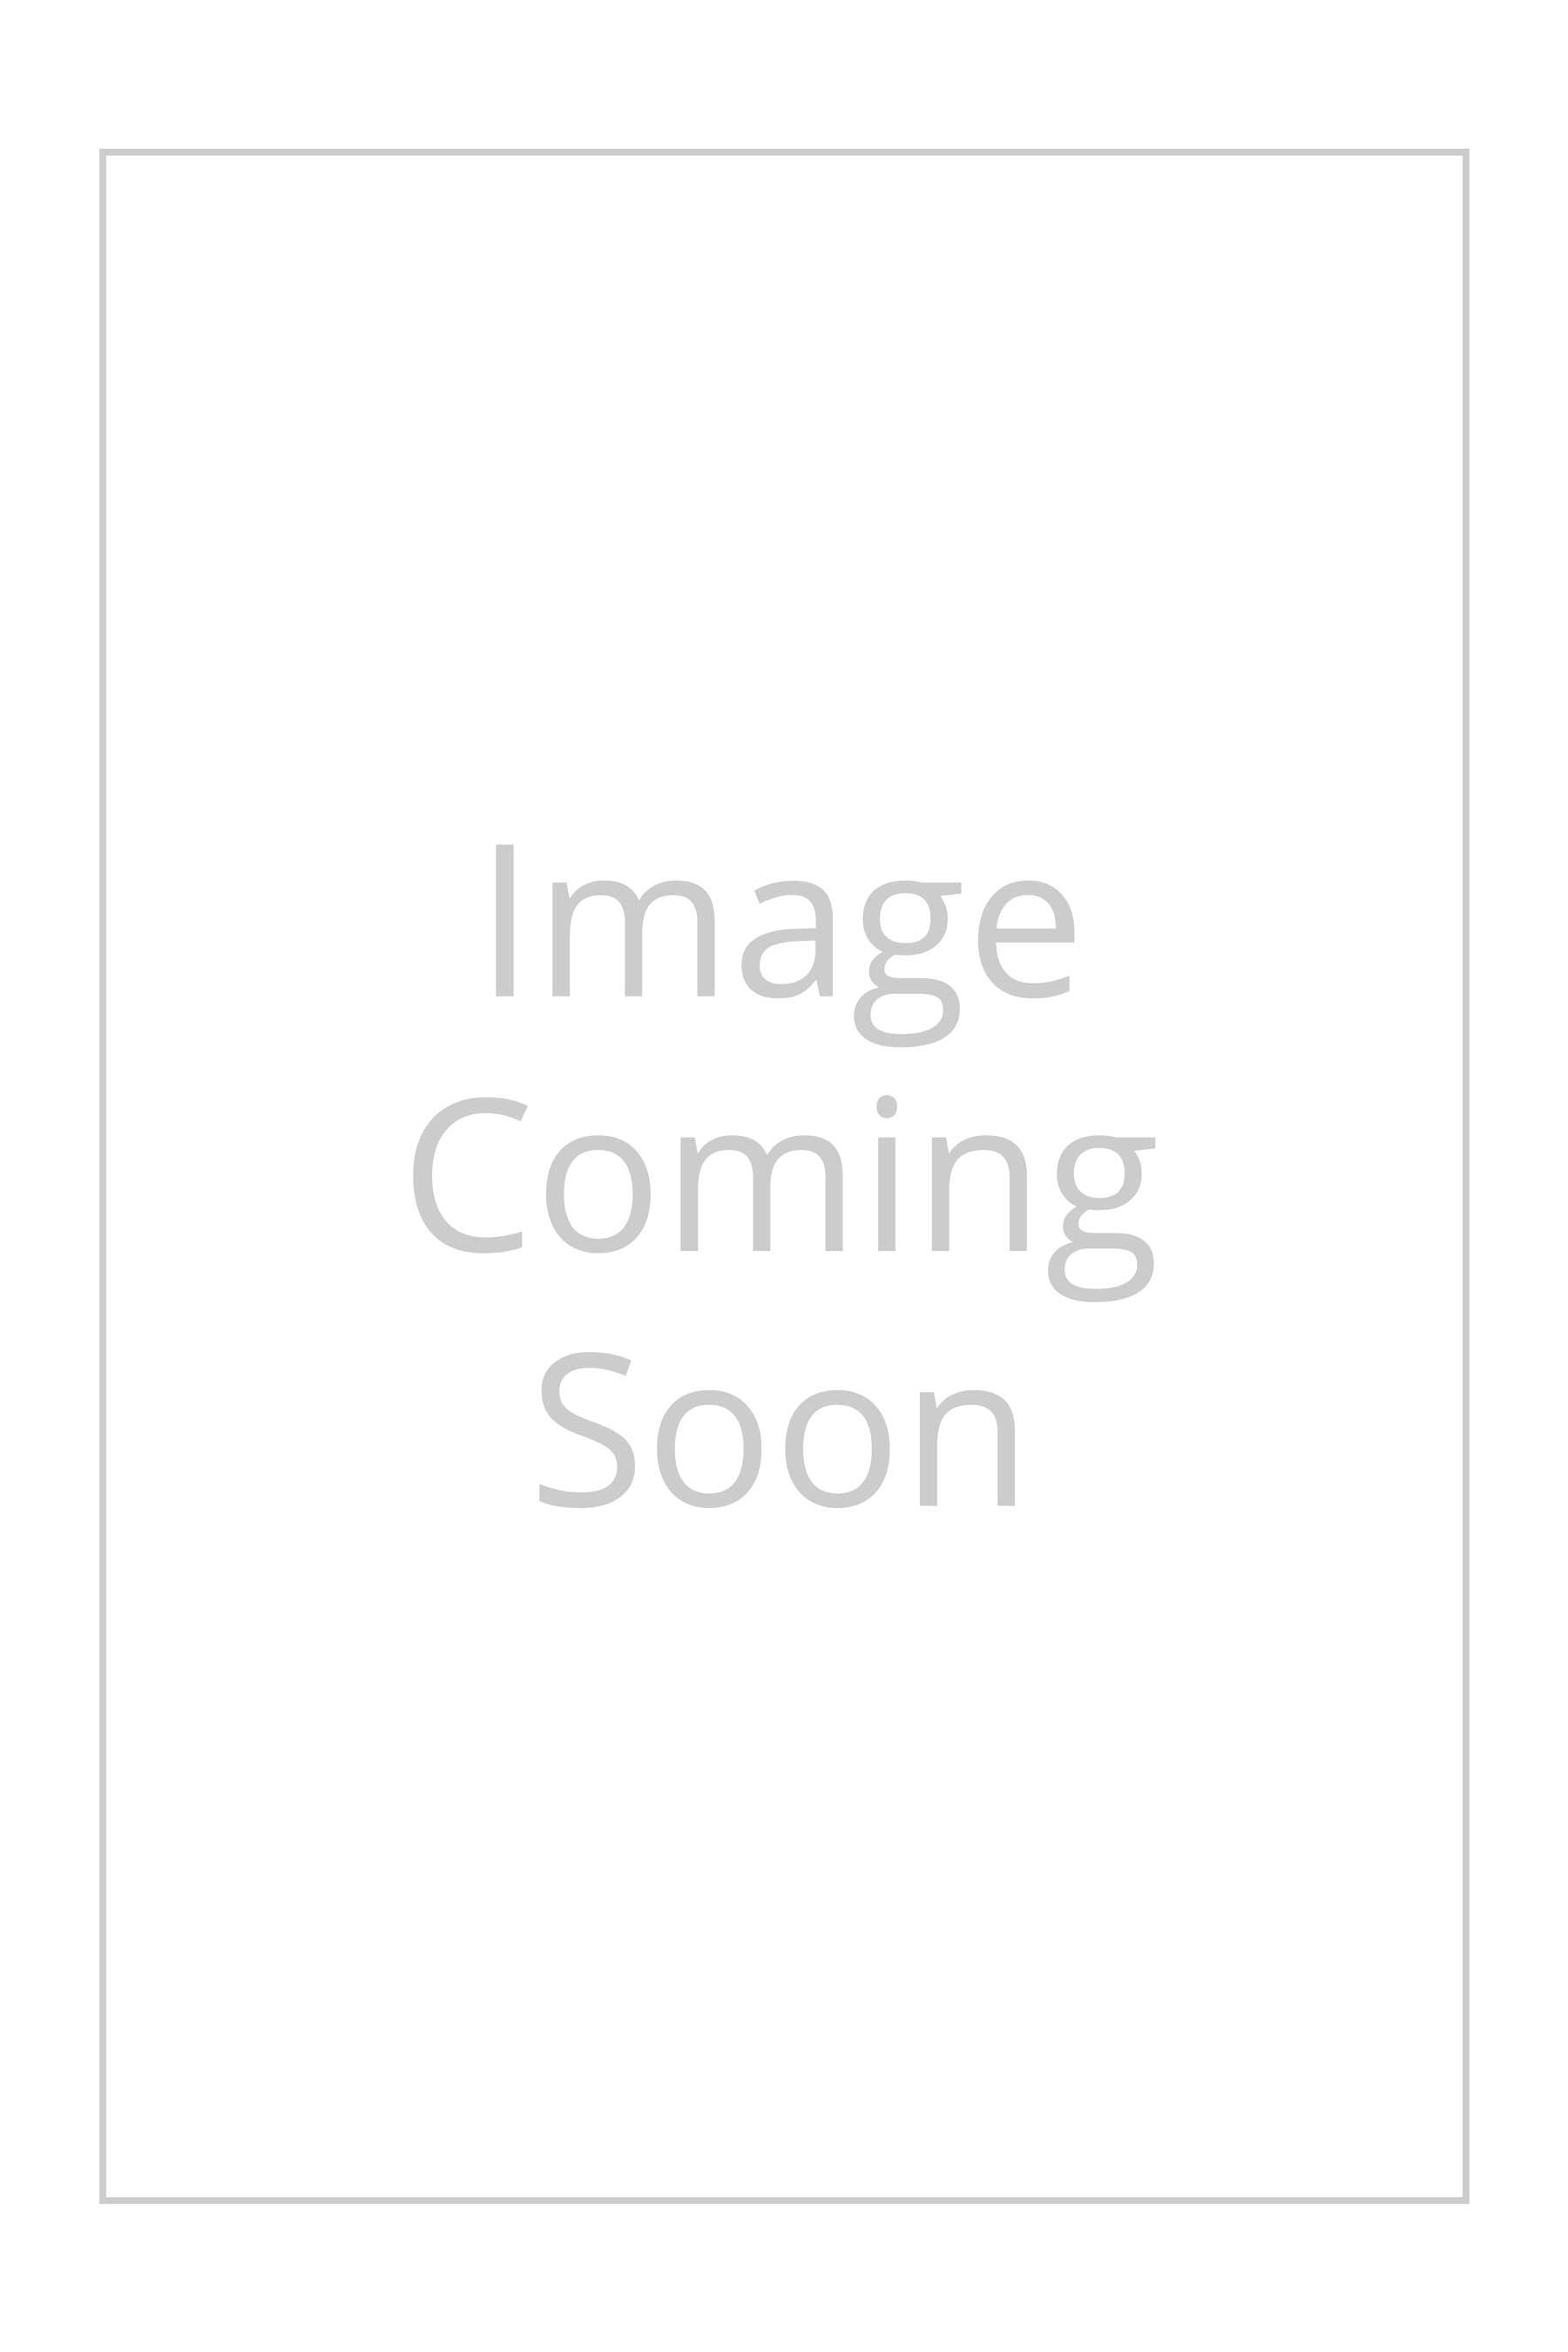 Stuart Weitzman Black Suede Loafer Style Pumps